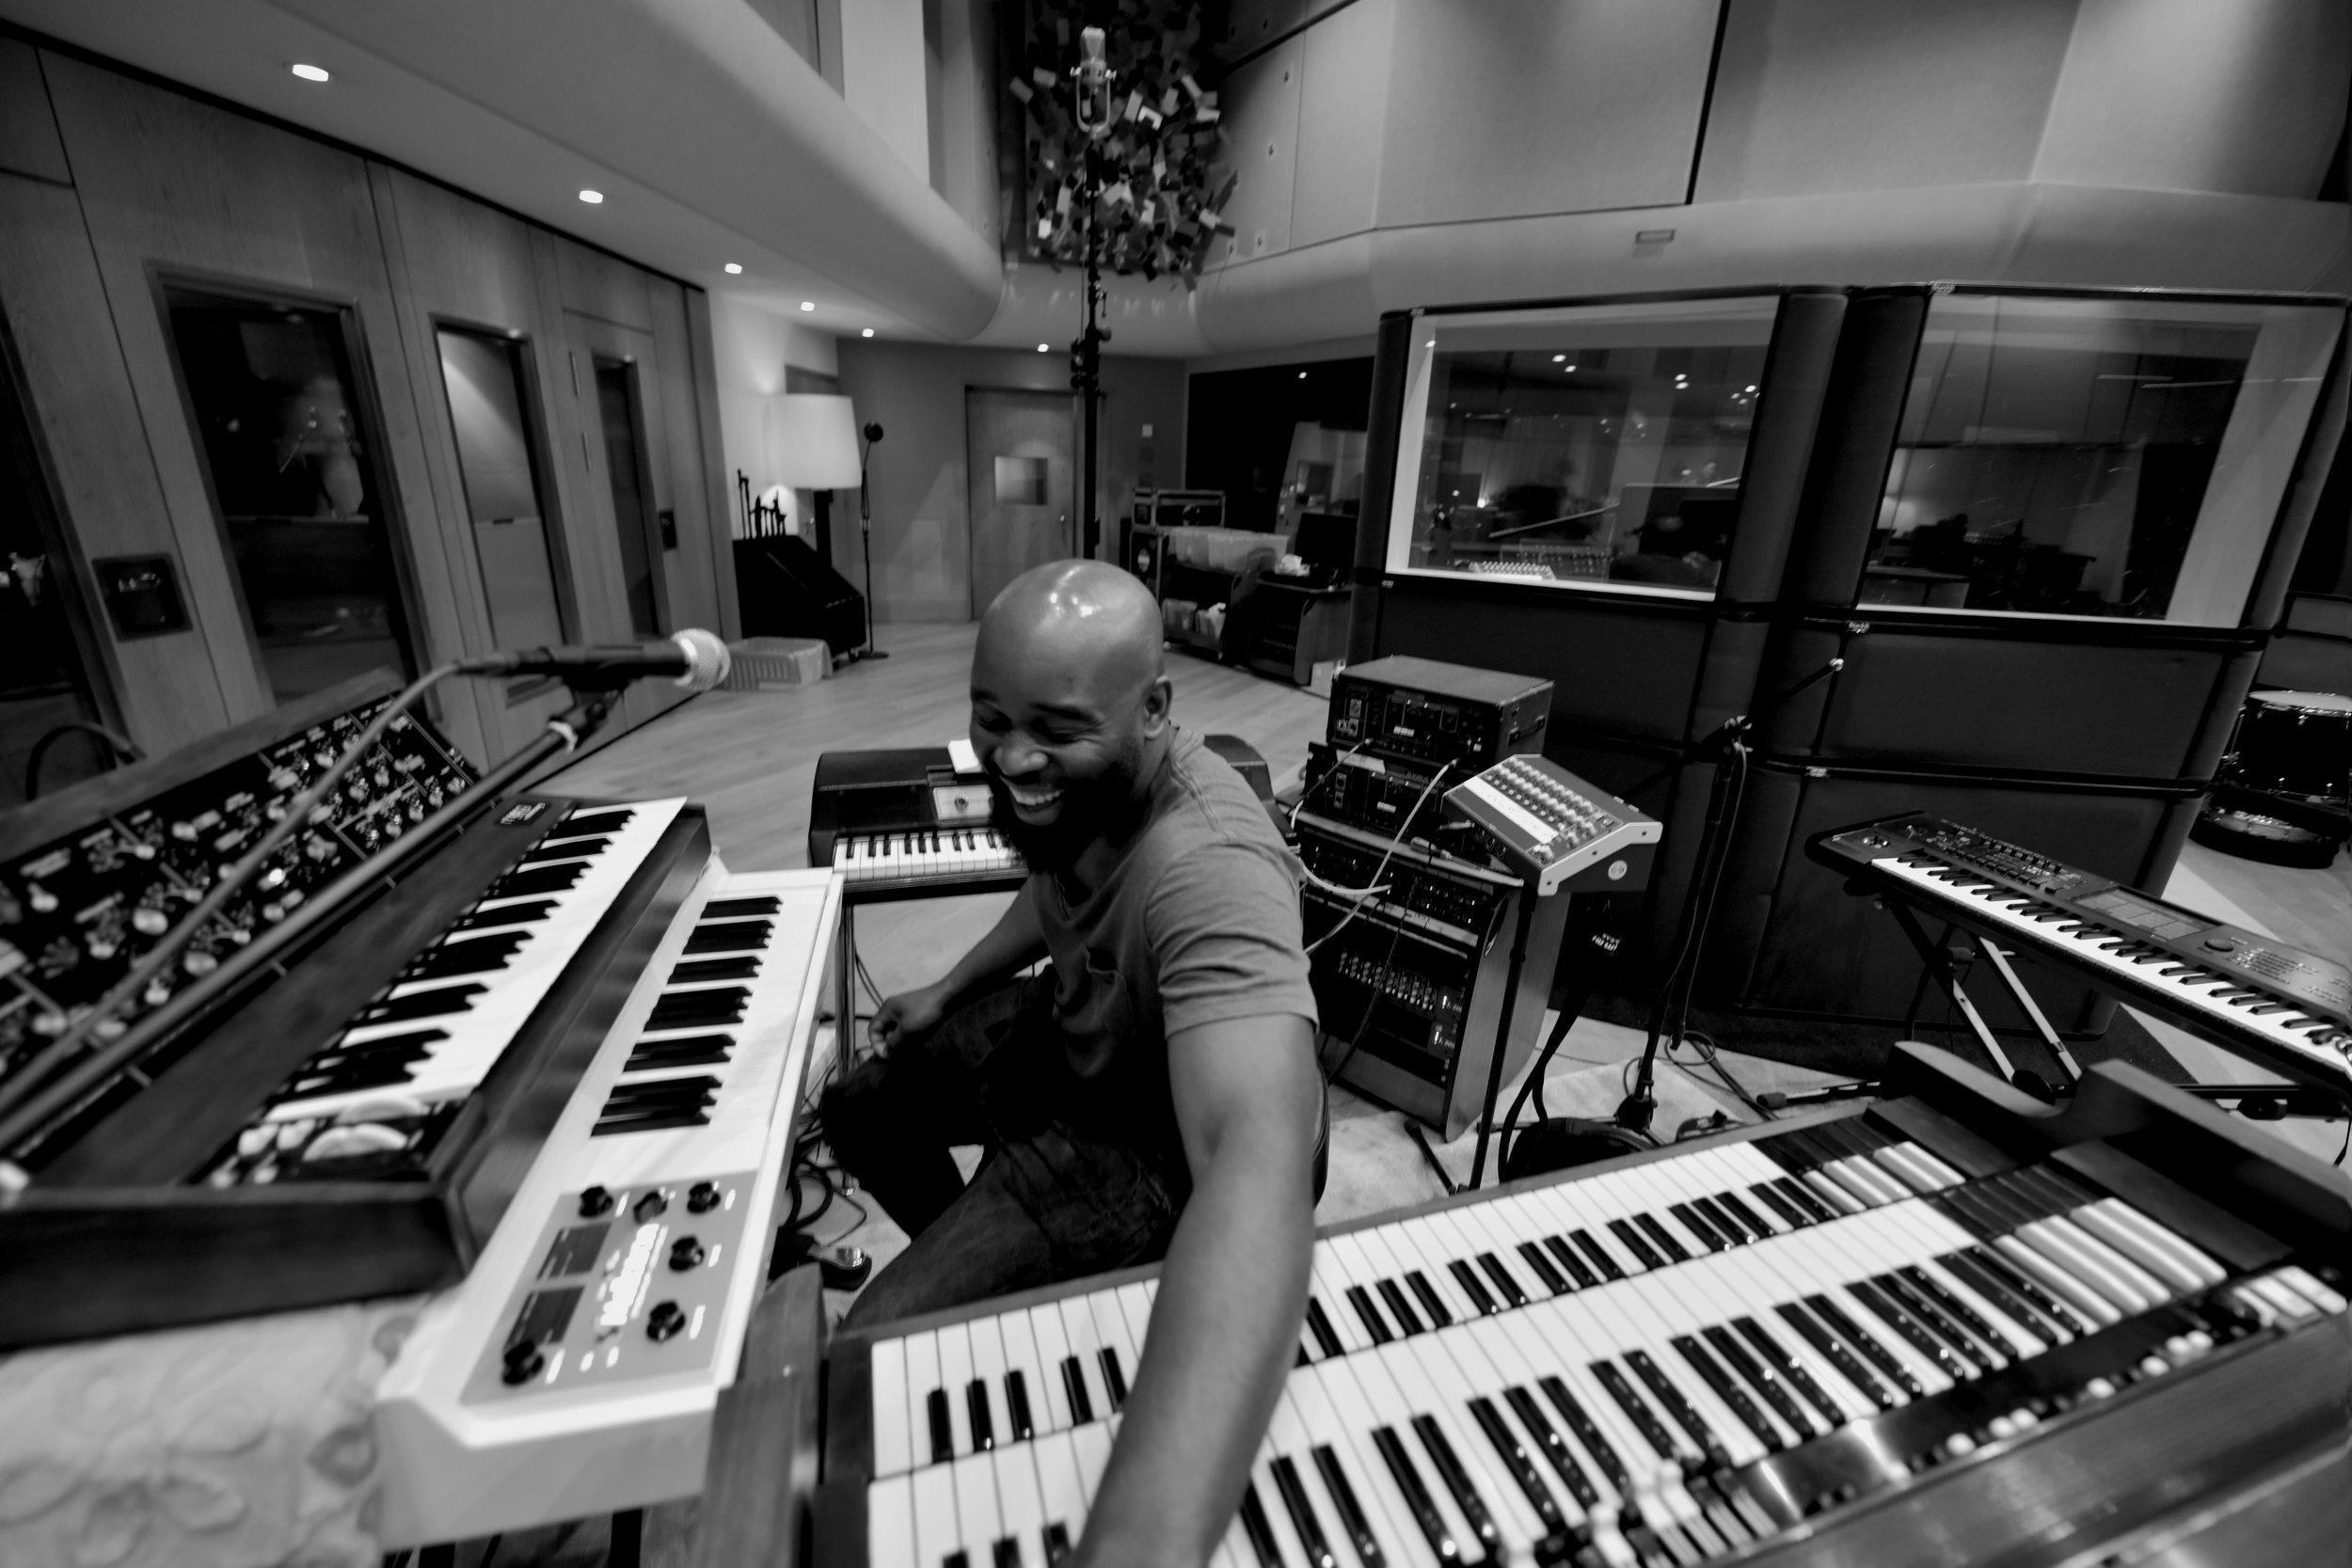 Photo by Stephen Lipson taken at British Grove Studios